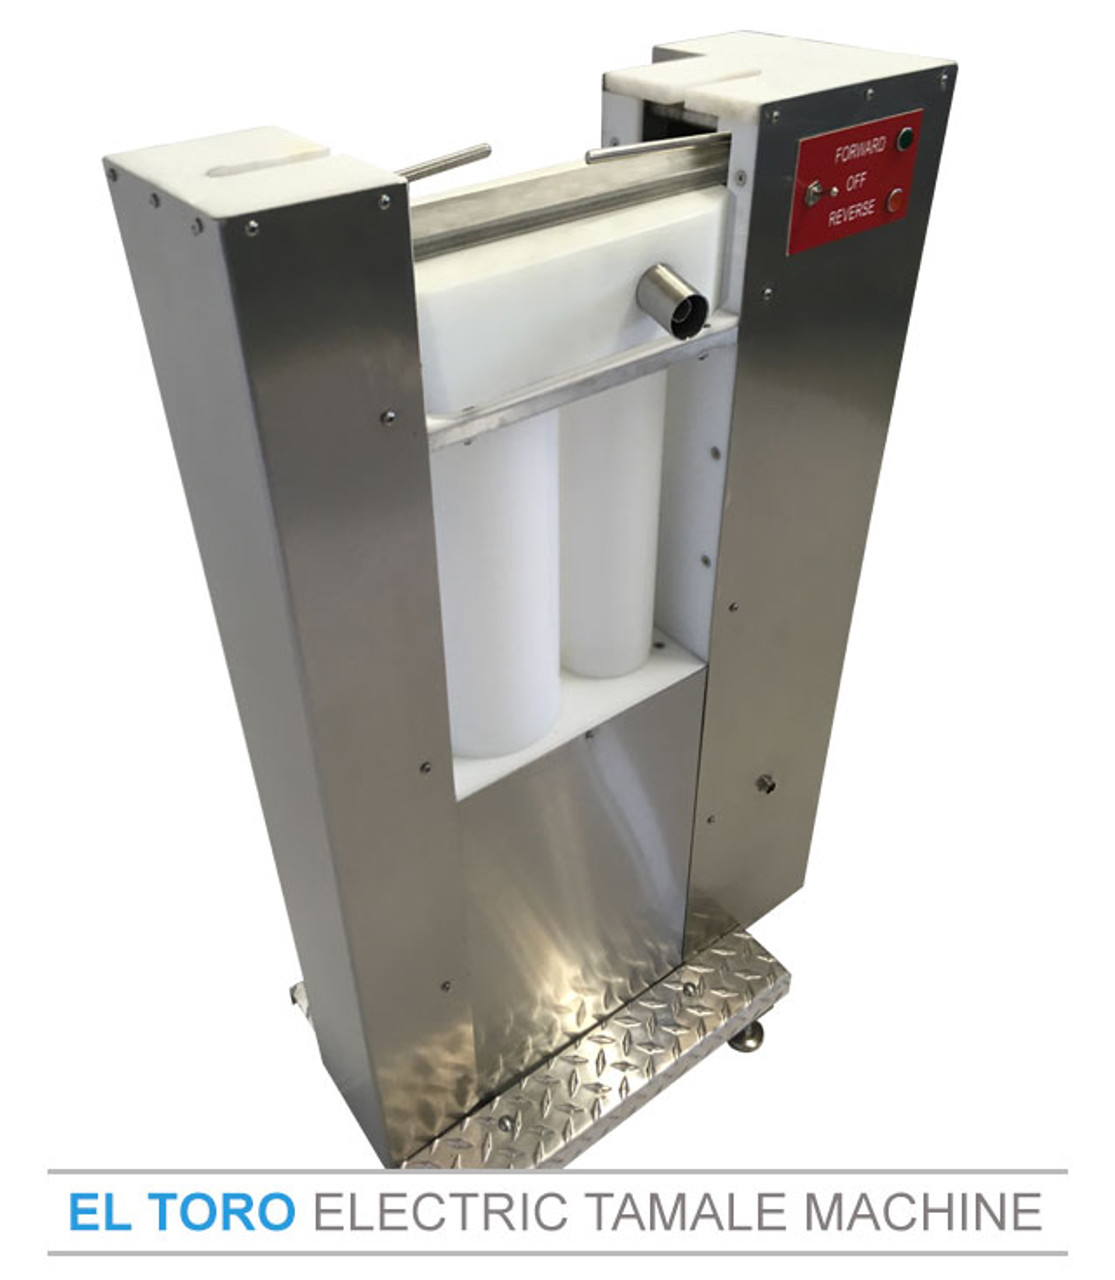 El Toro - 100% Electric Tamale Machine